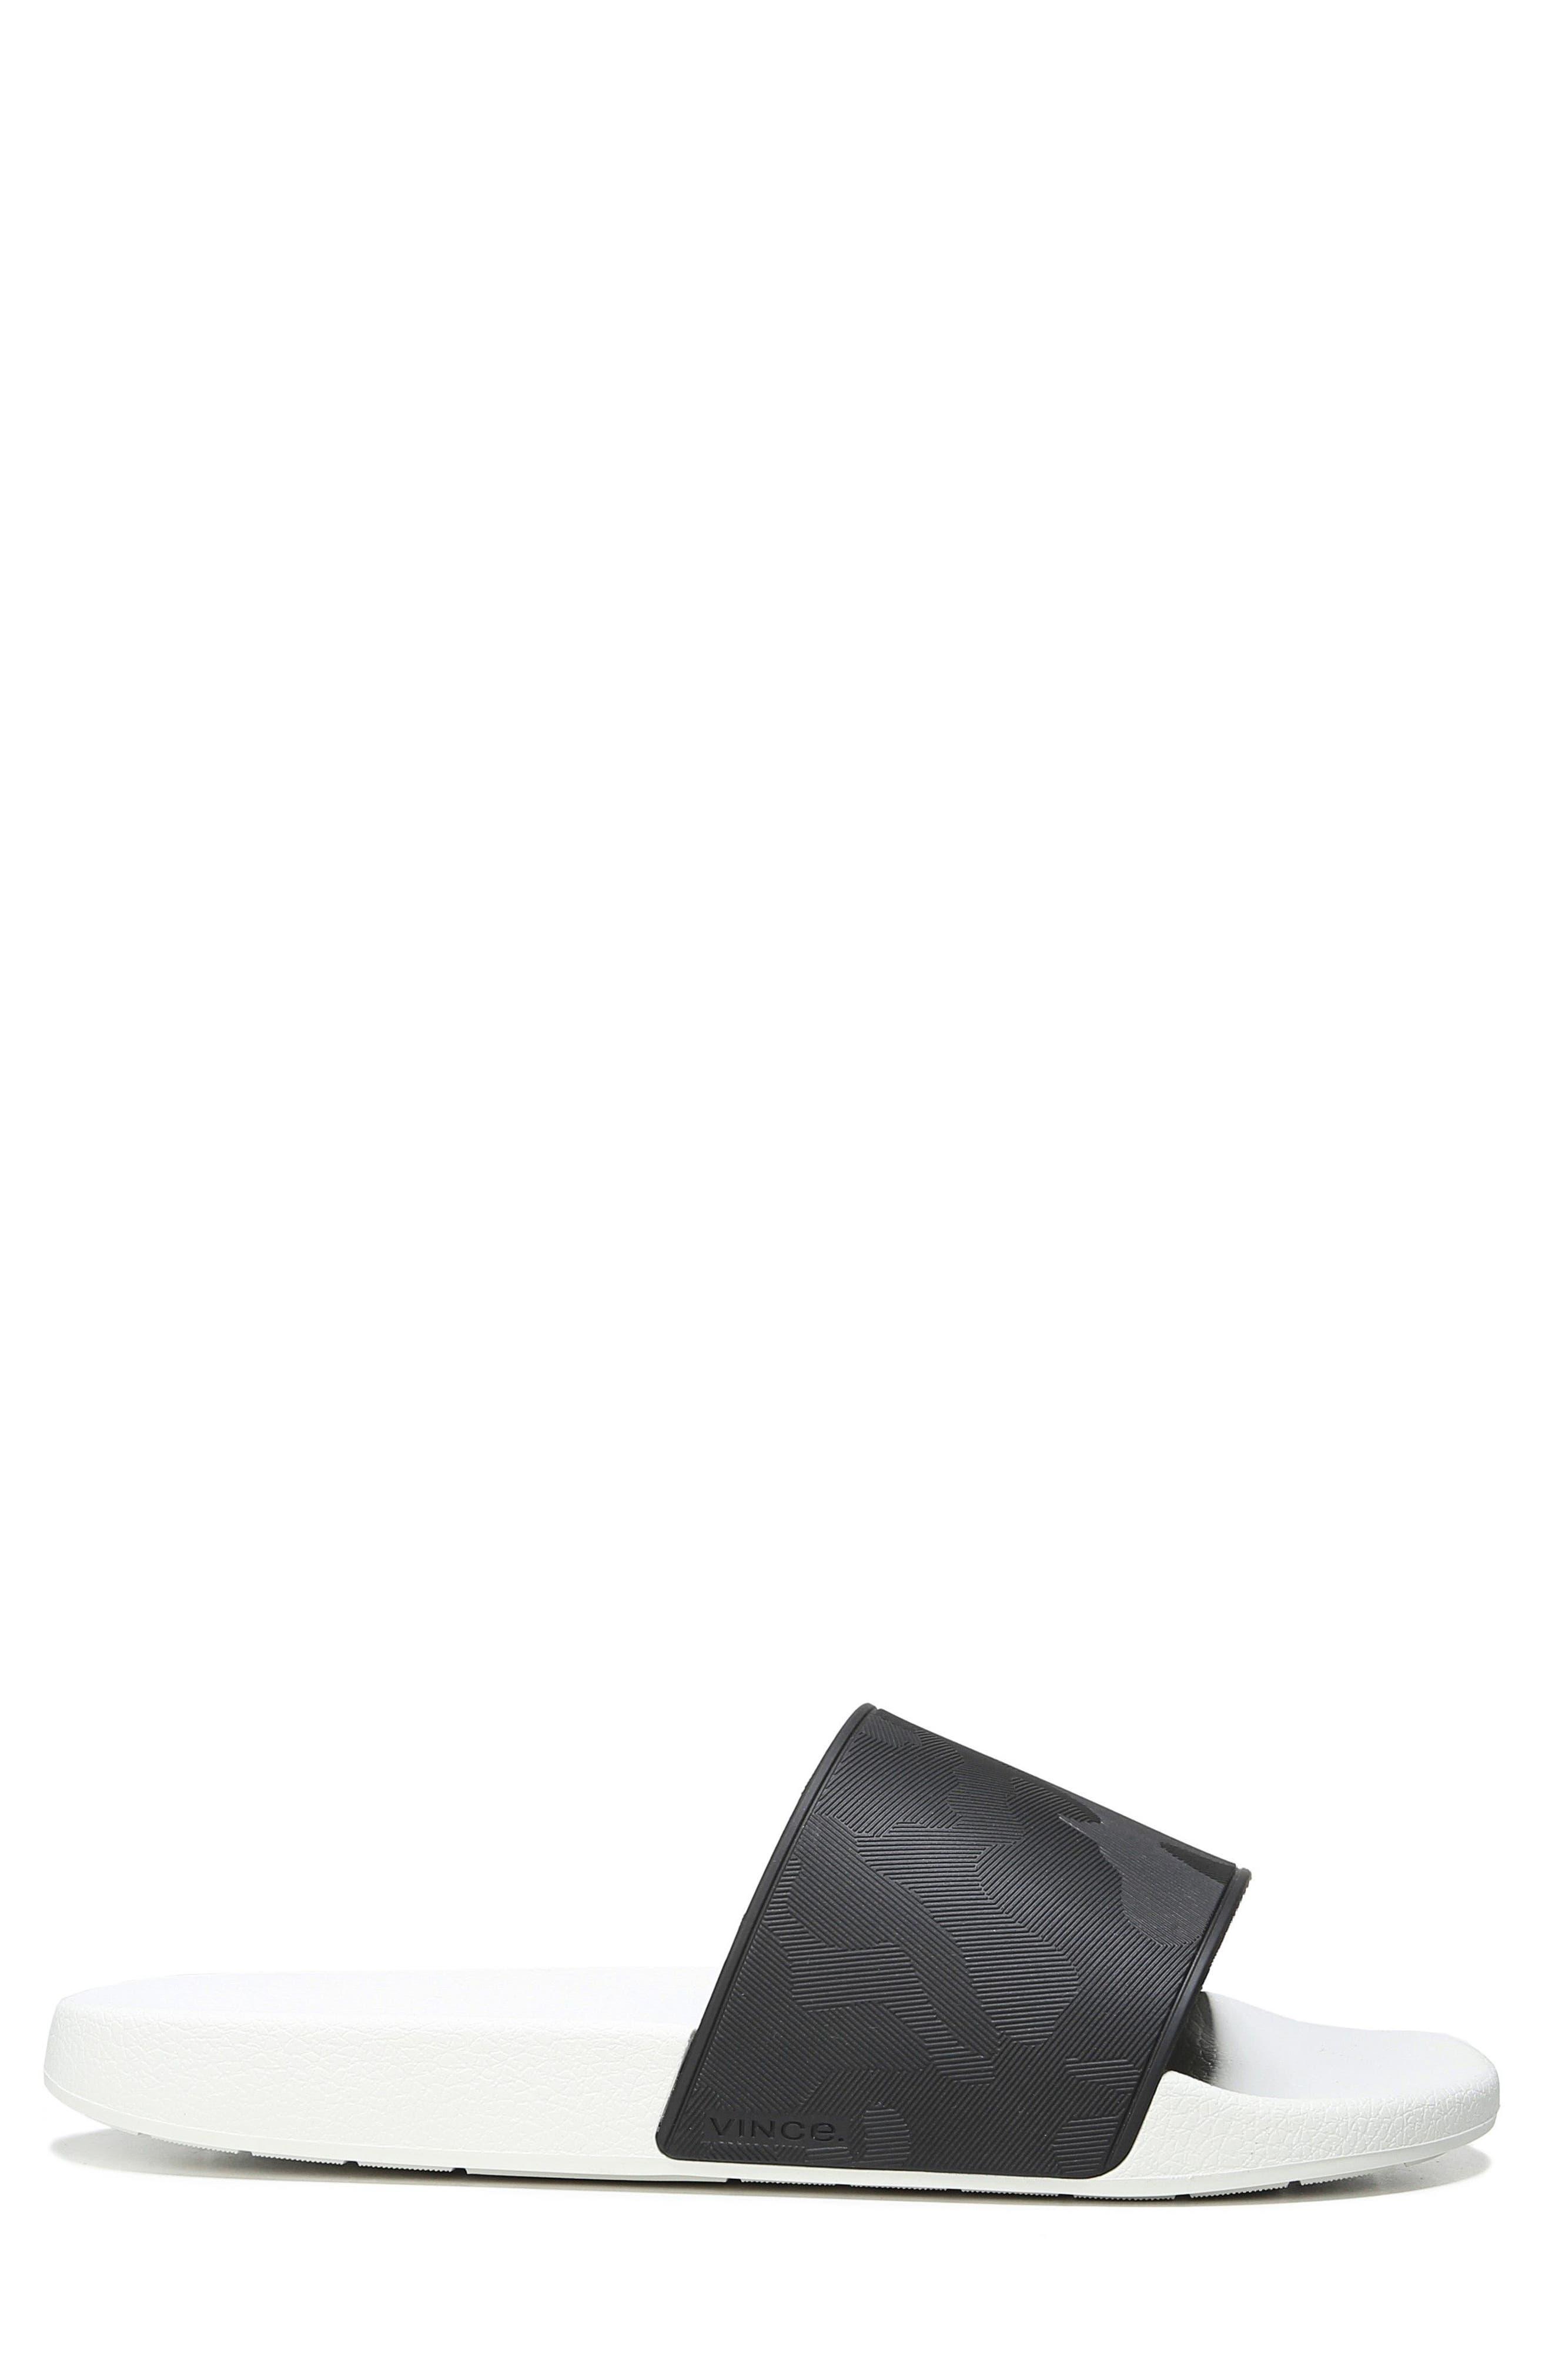 Westcoast-2 Slide Sandal,                             Alternate thumbnail 3, color,                             Black